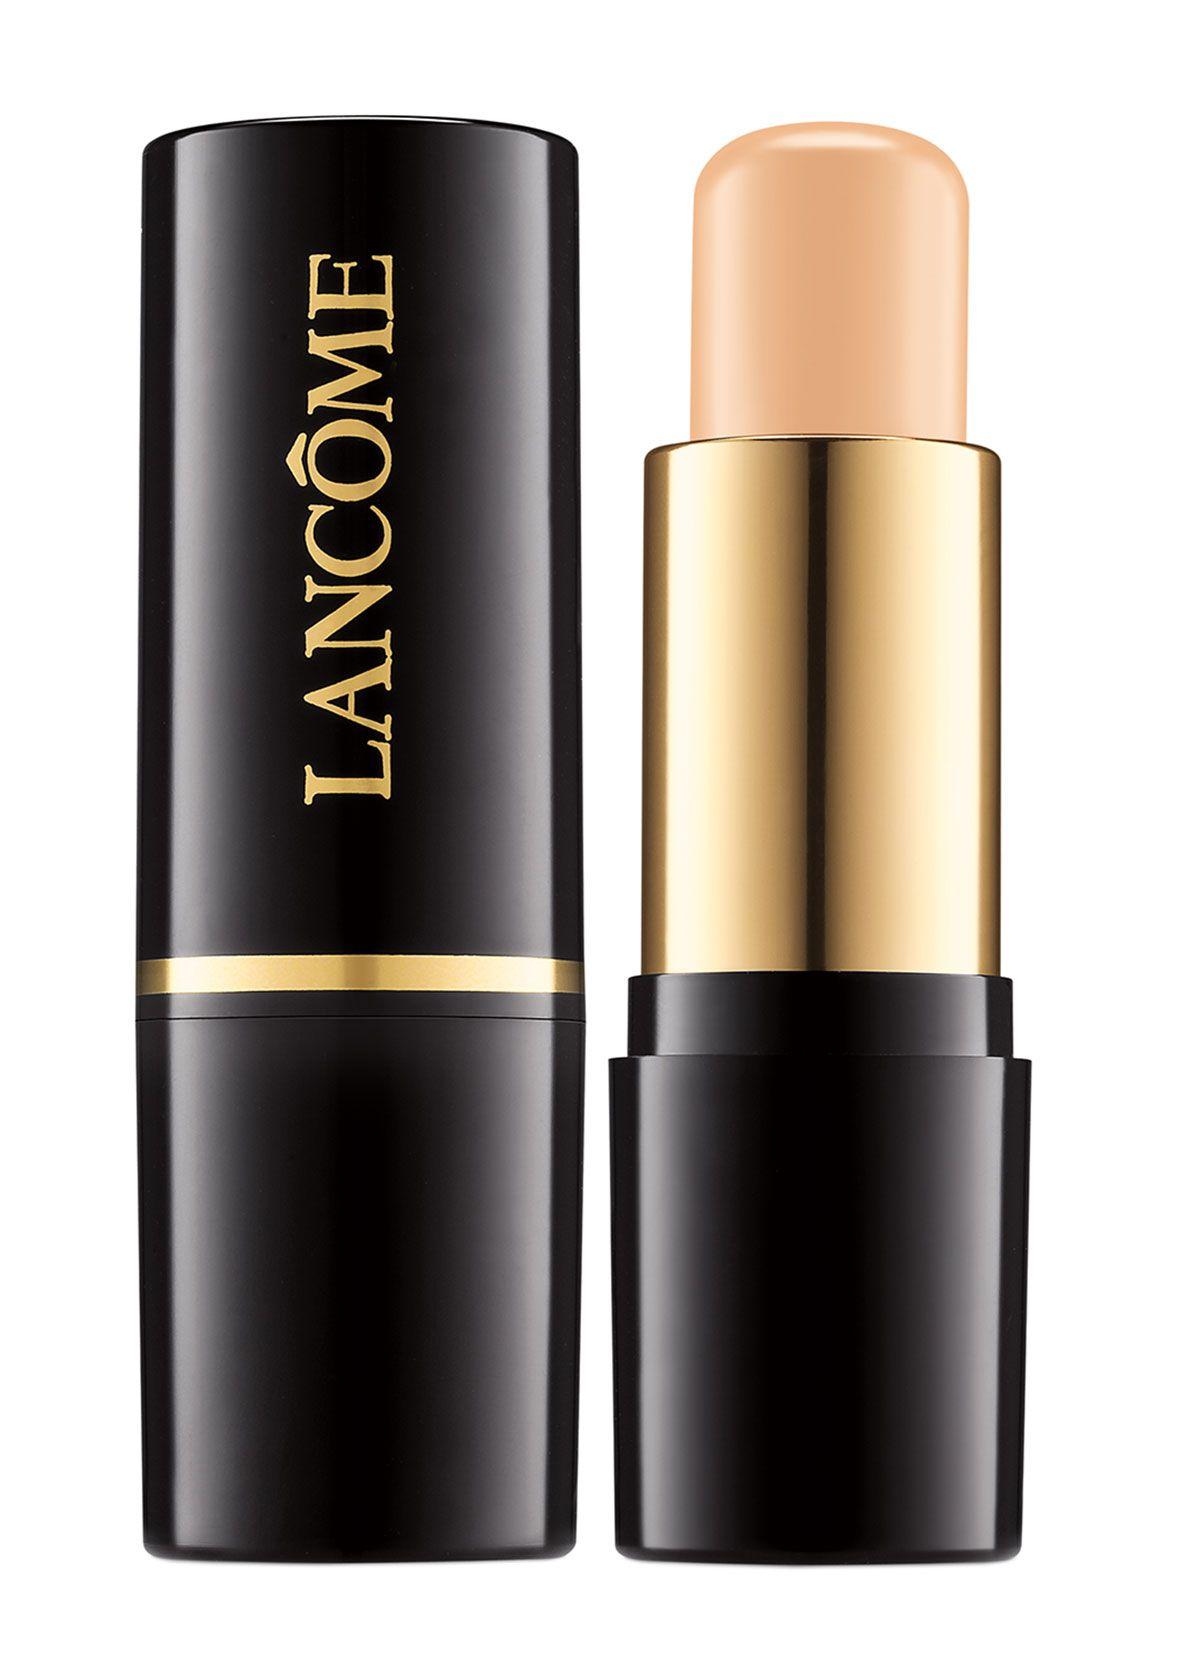 Lancôme Teint Idole Ultra Longwear Foundation Stick SPF 21